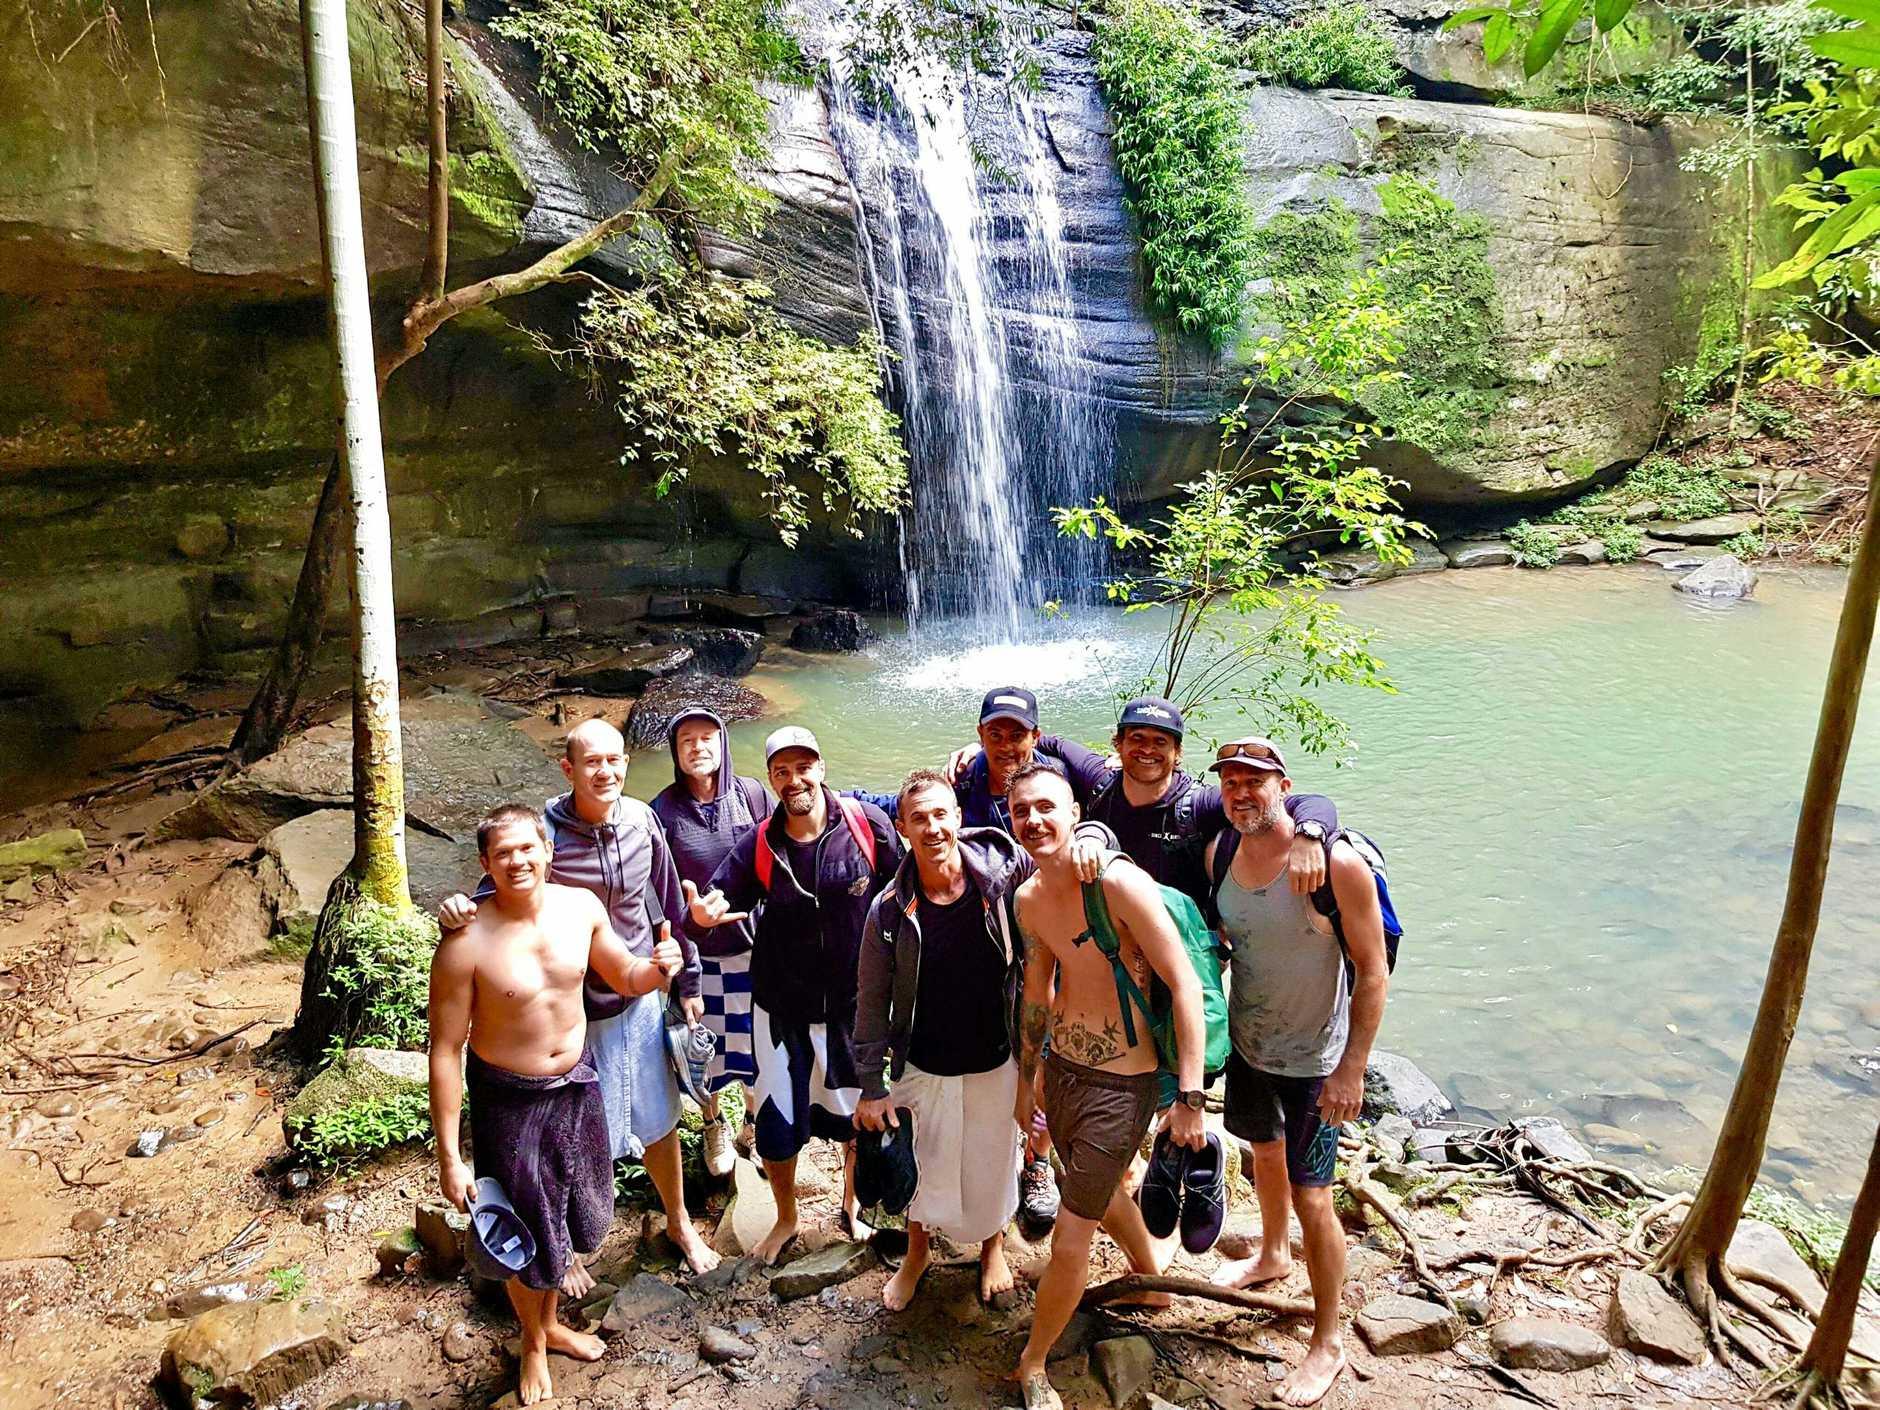 BlokesVenture in a three-day trip into the Sunshine Coast wilderness.